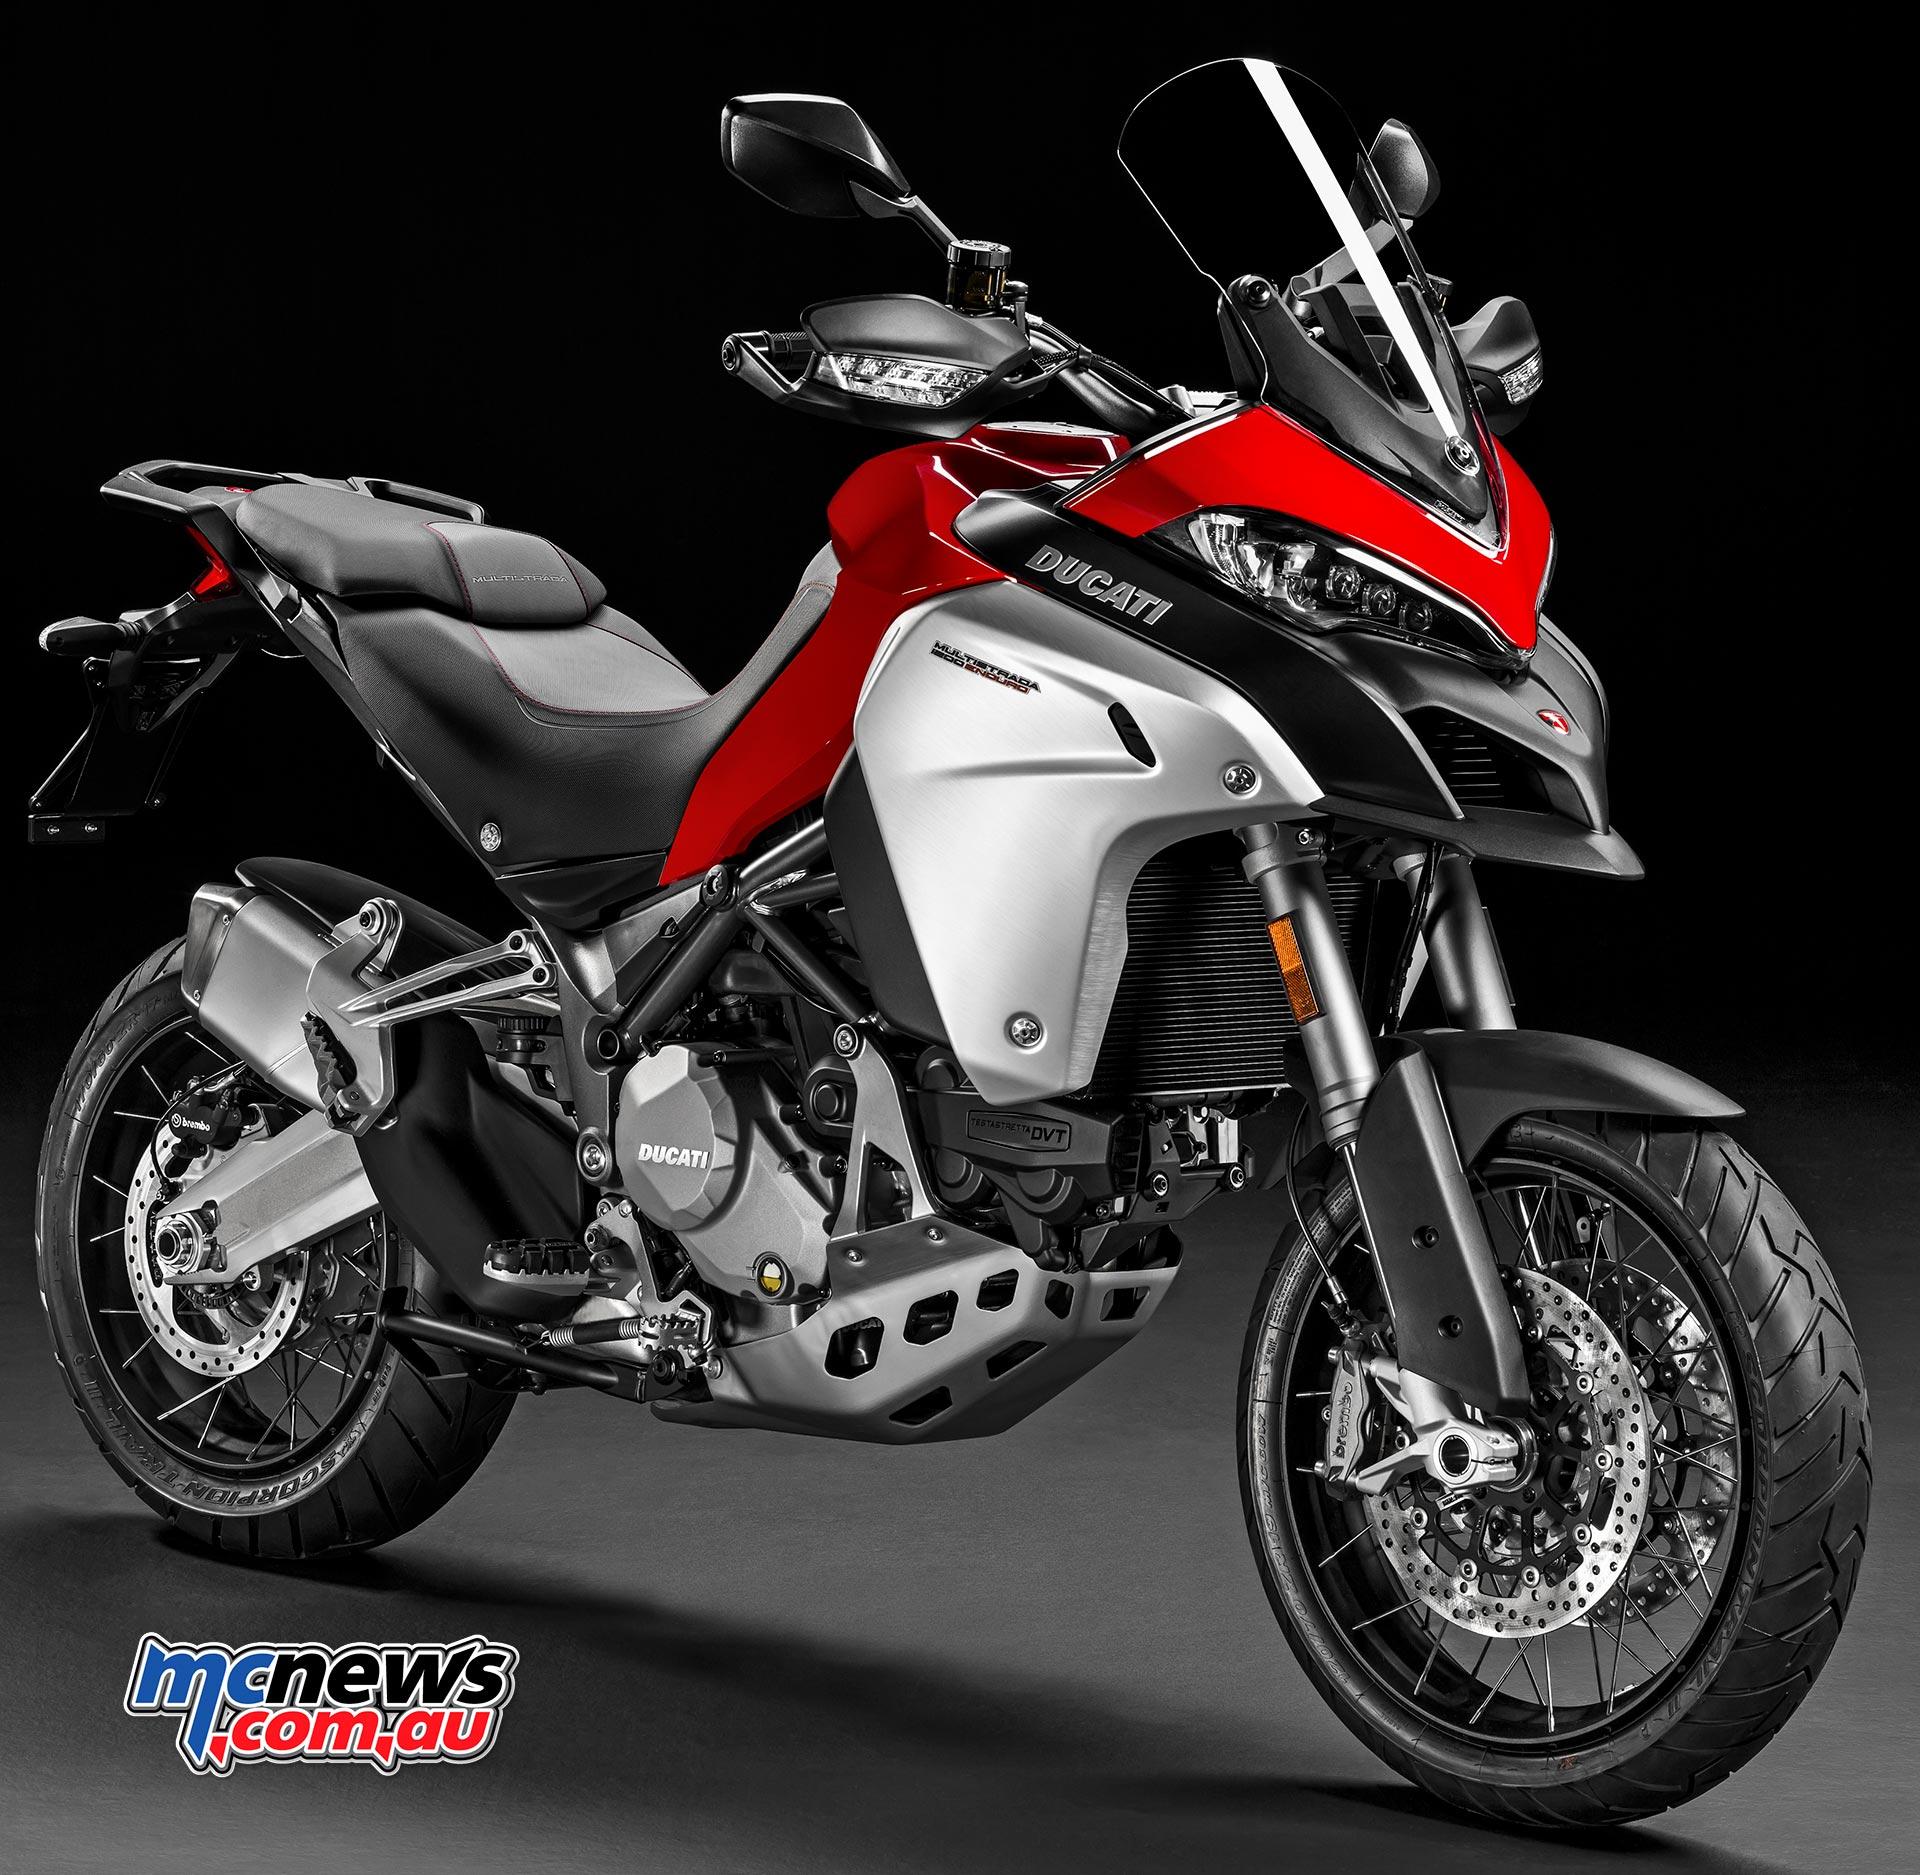 2017 Ducati Multistrada Enduro tweaked